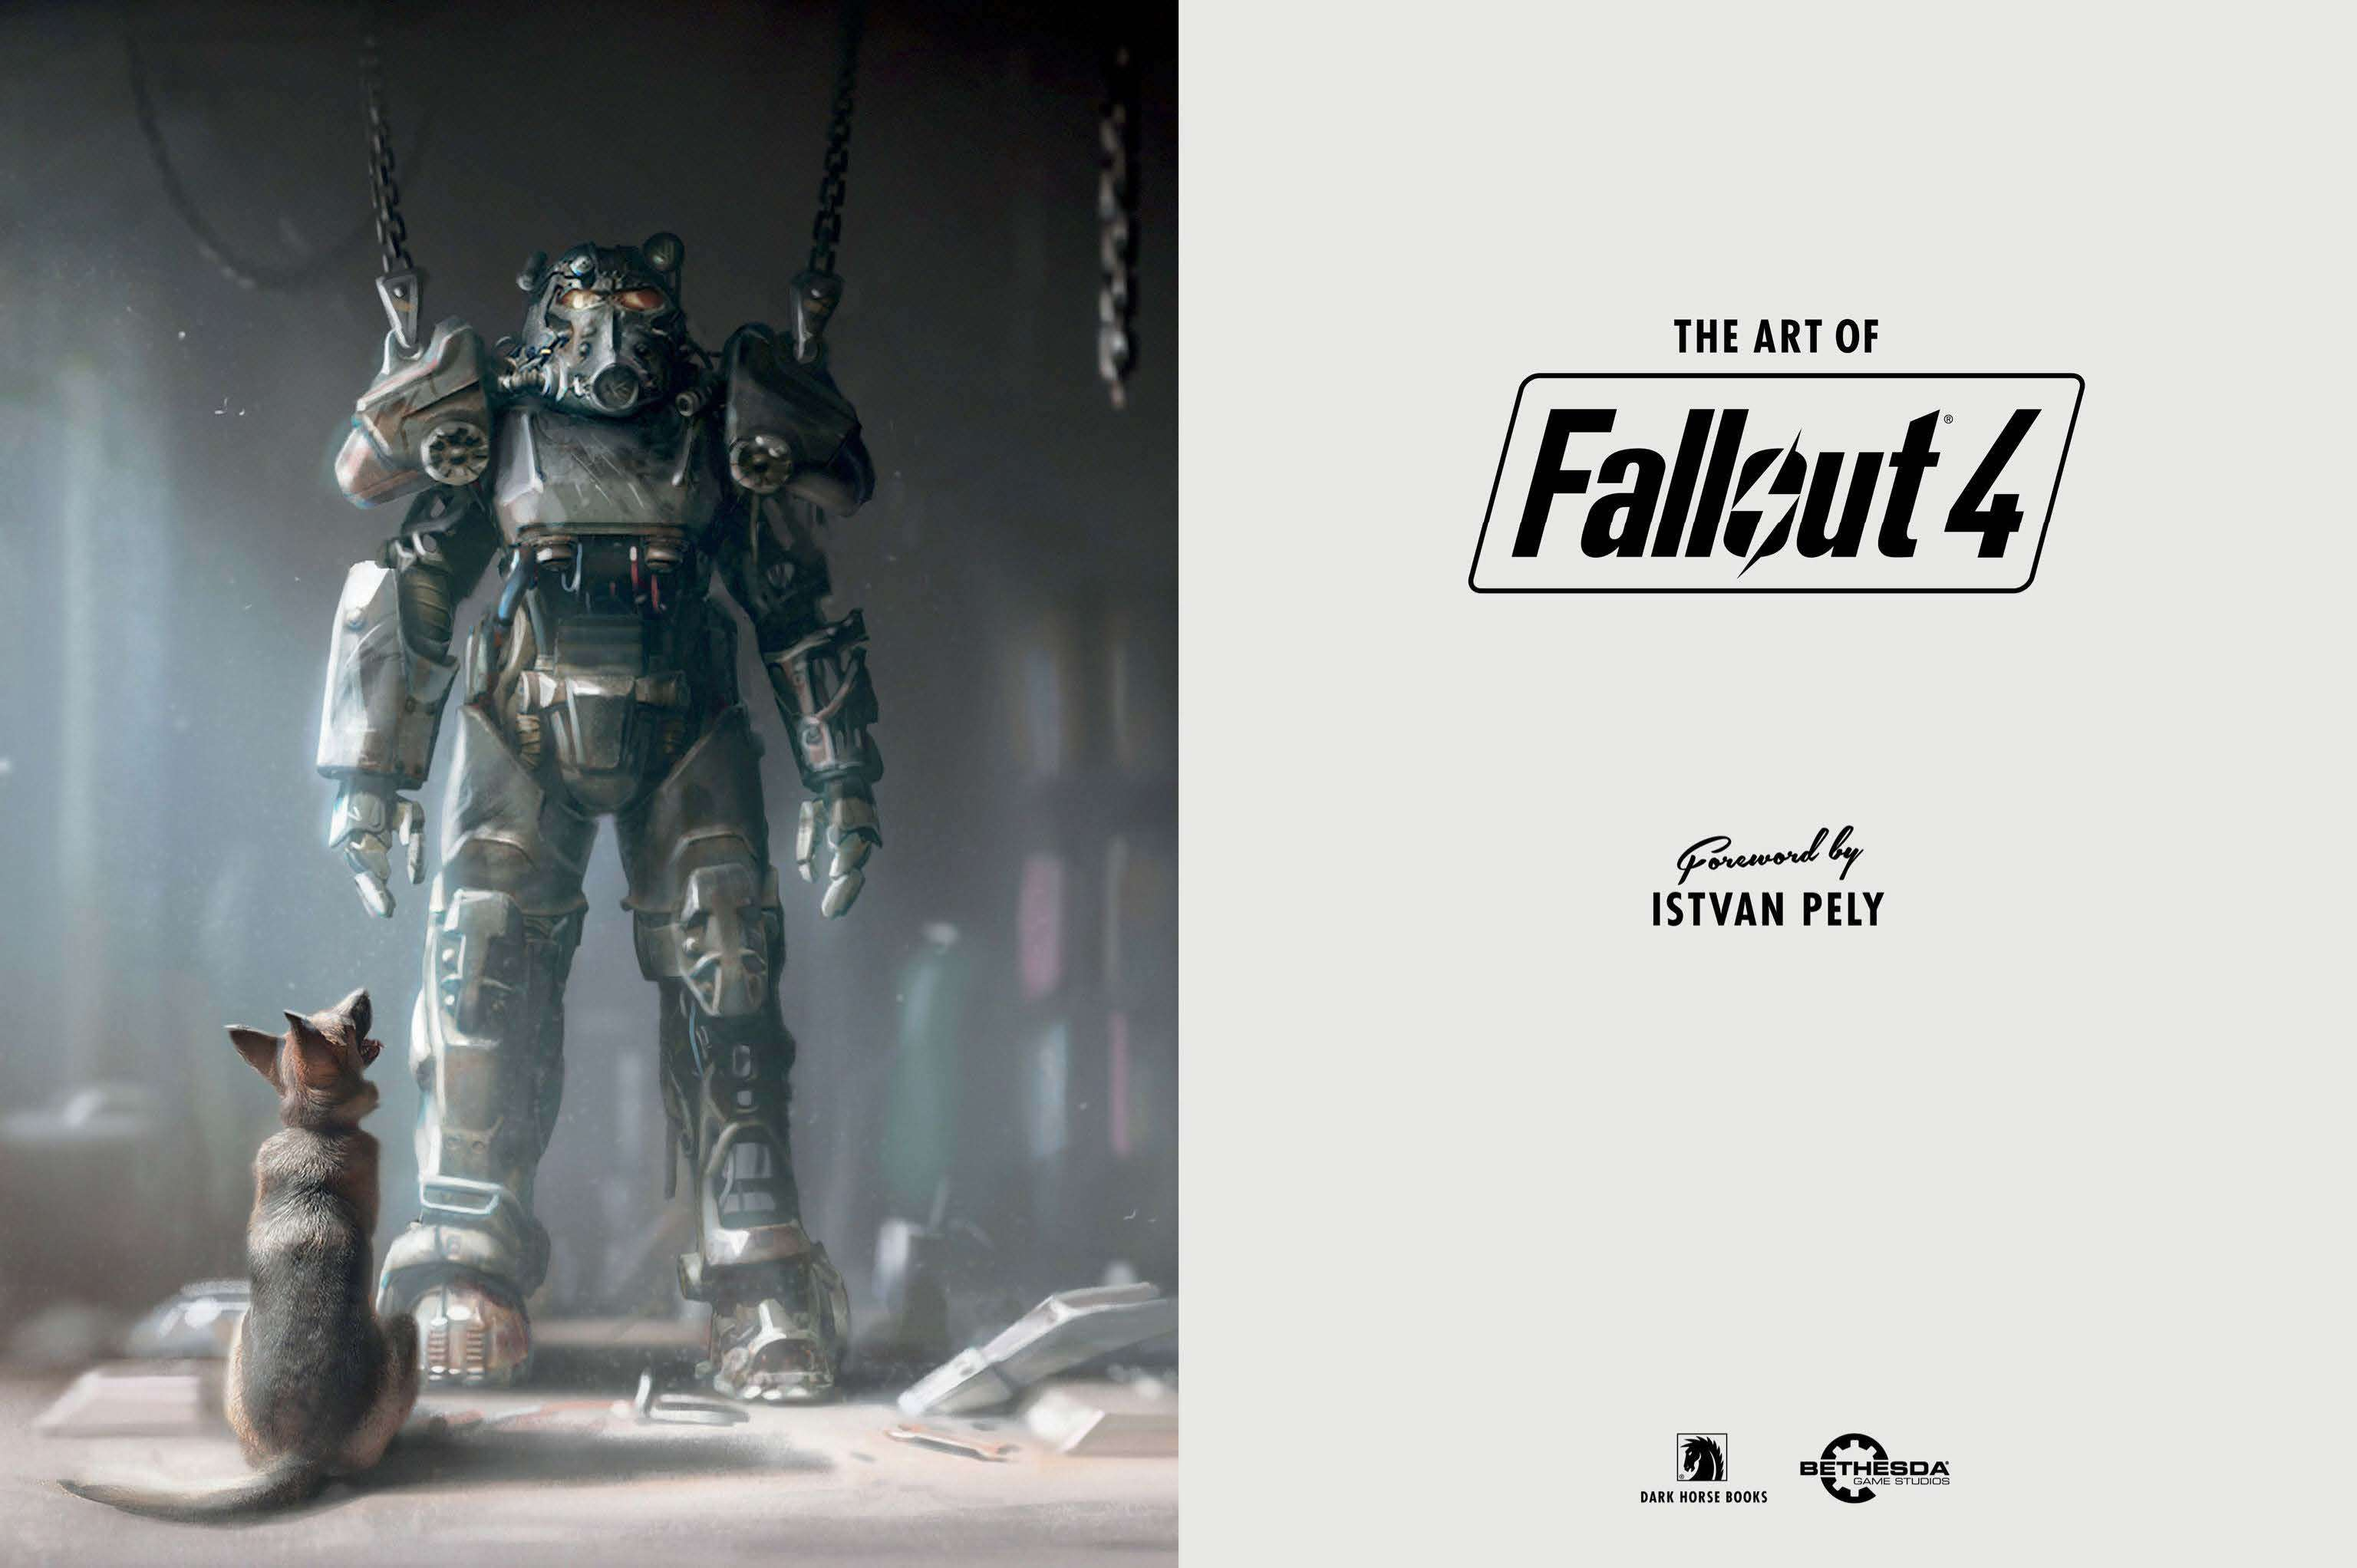 The Art of Fallout 4 - # 002 - Fallout 4 Артбук